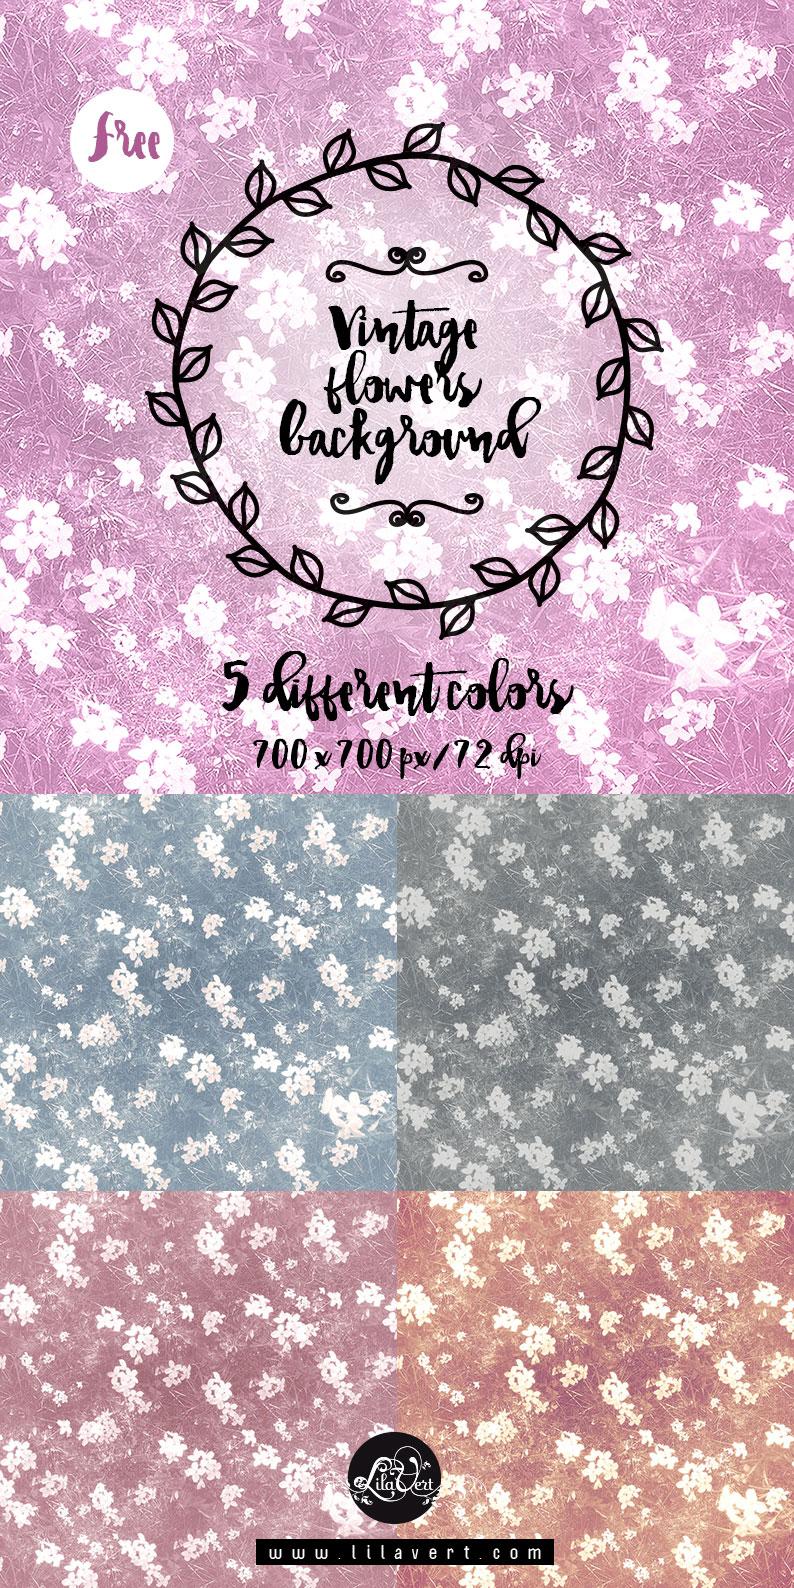 Free vintage flowers background textures - stock photos